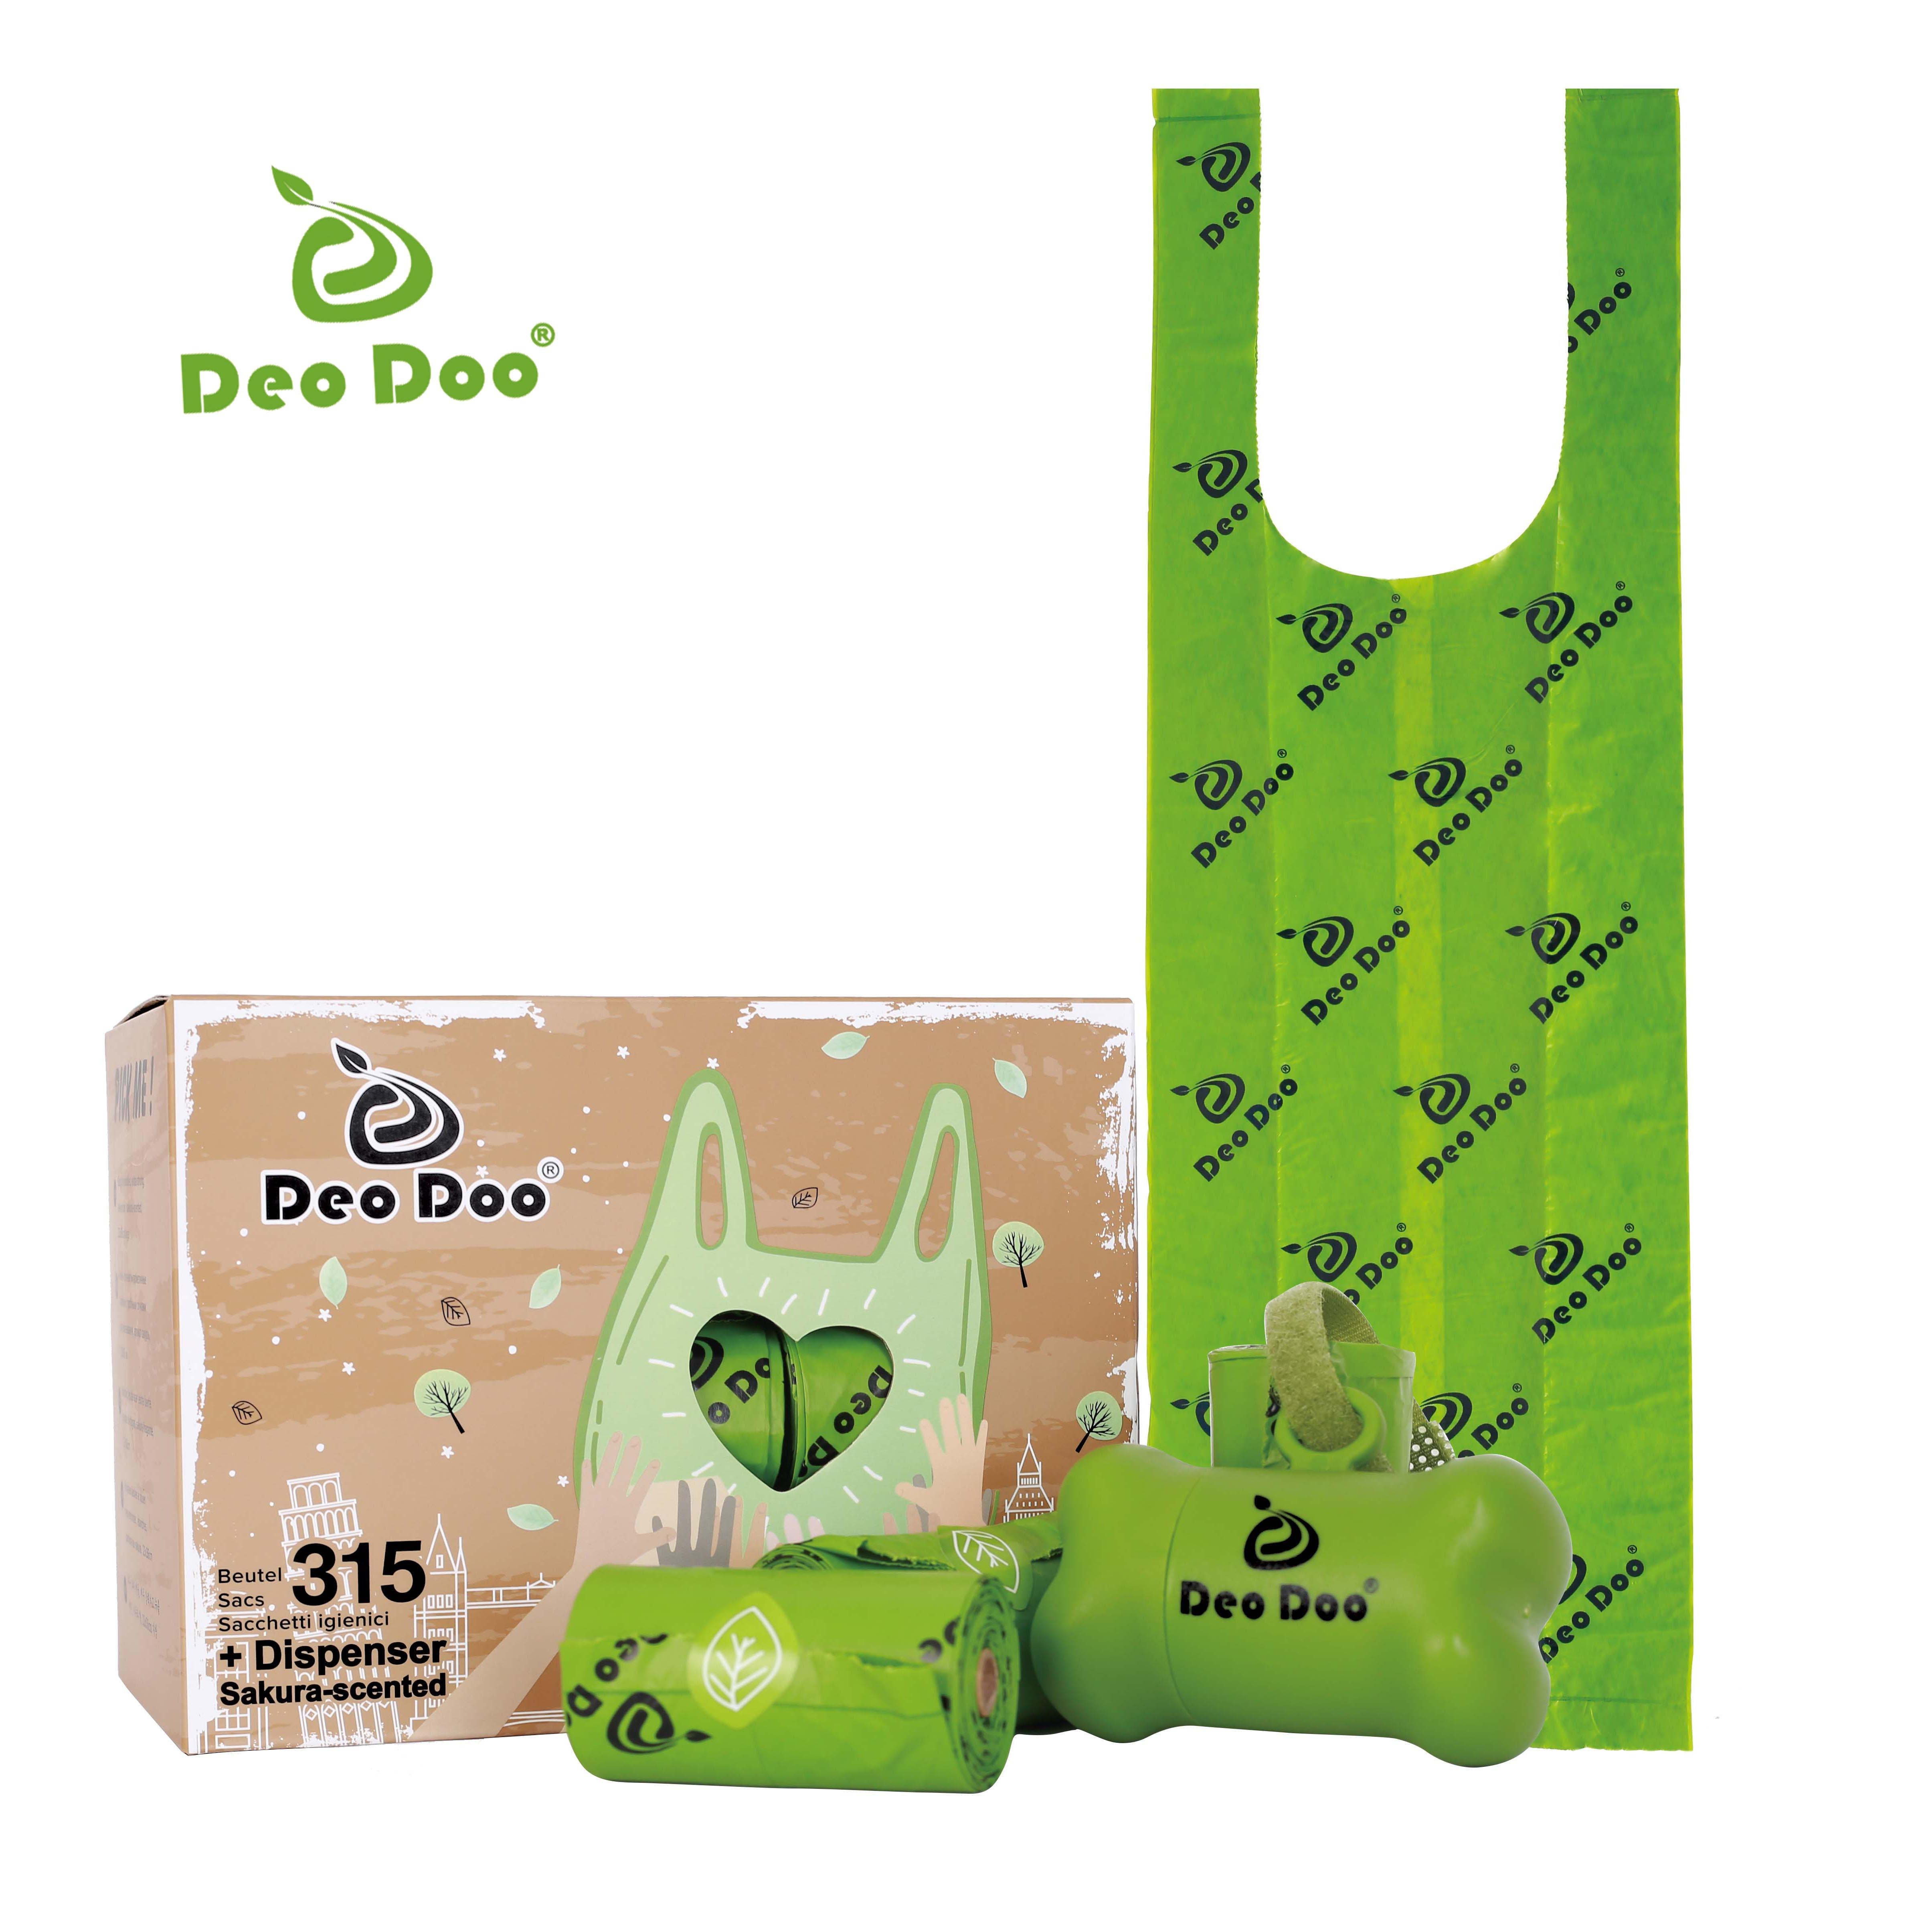 Bolsa para popó de perro con mango, 21 rollos, 315 bolsas biodegradables,...